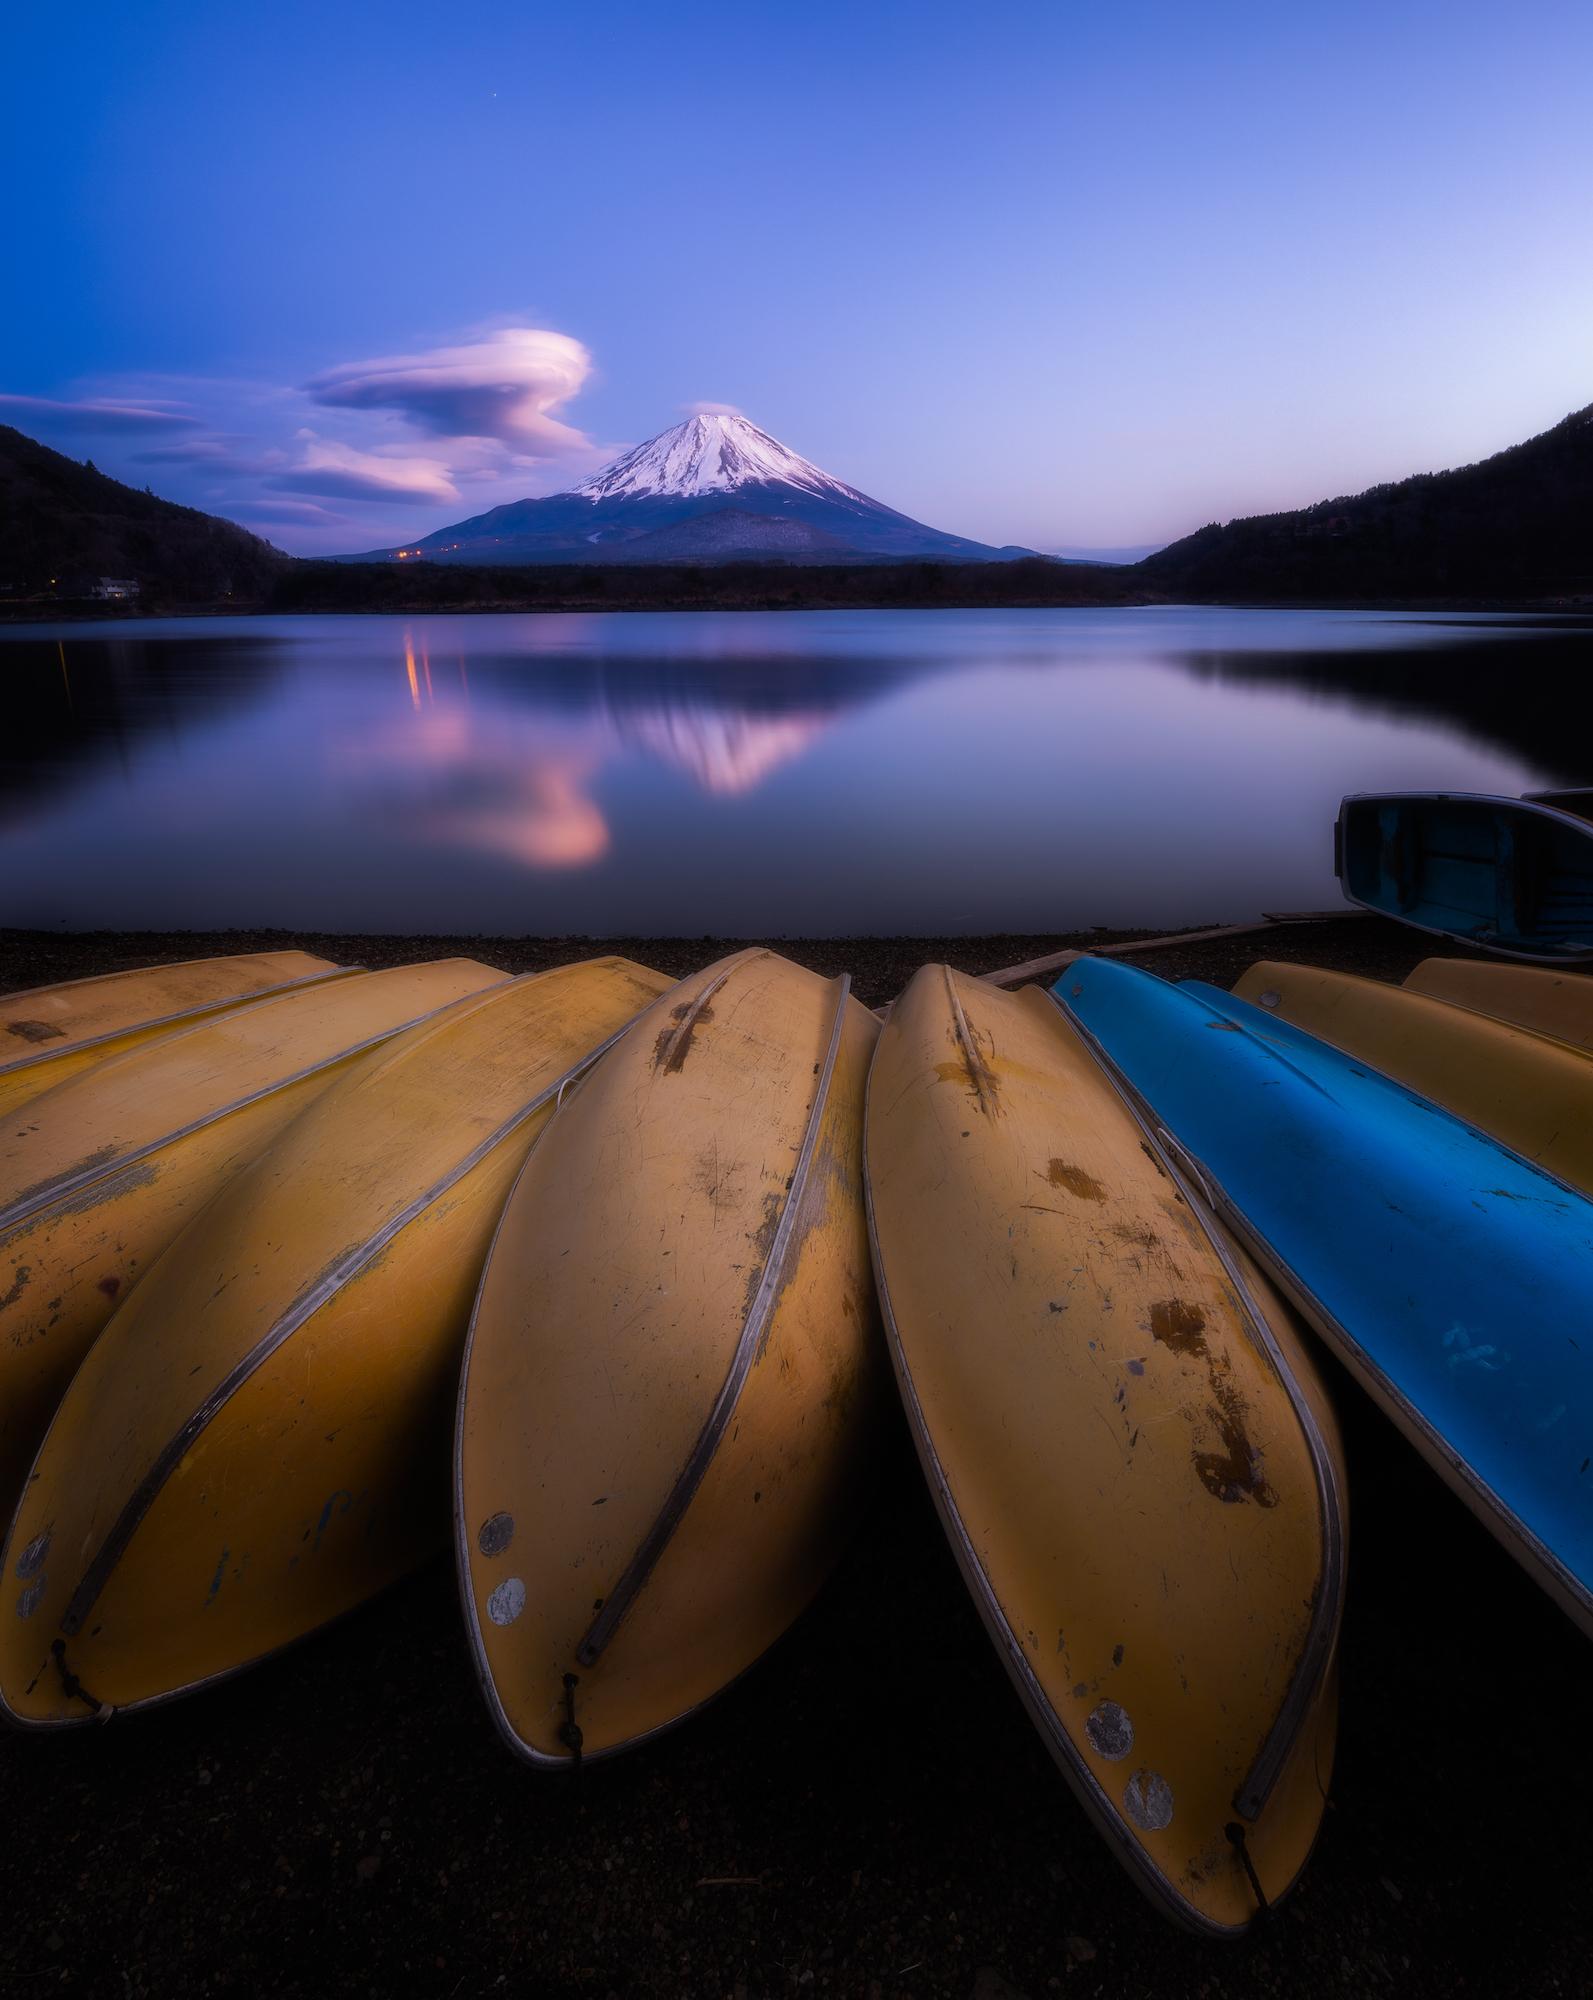 Sunset reflections at Lake Shoji, Japan